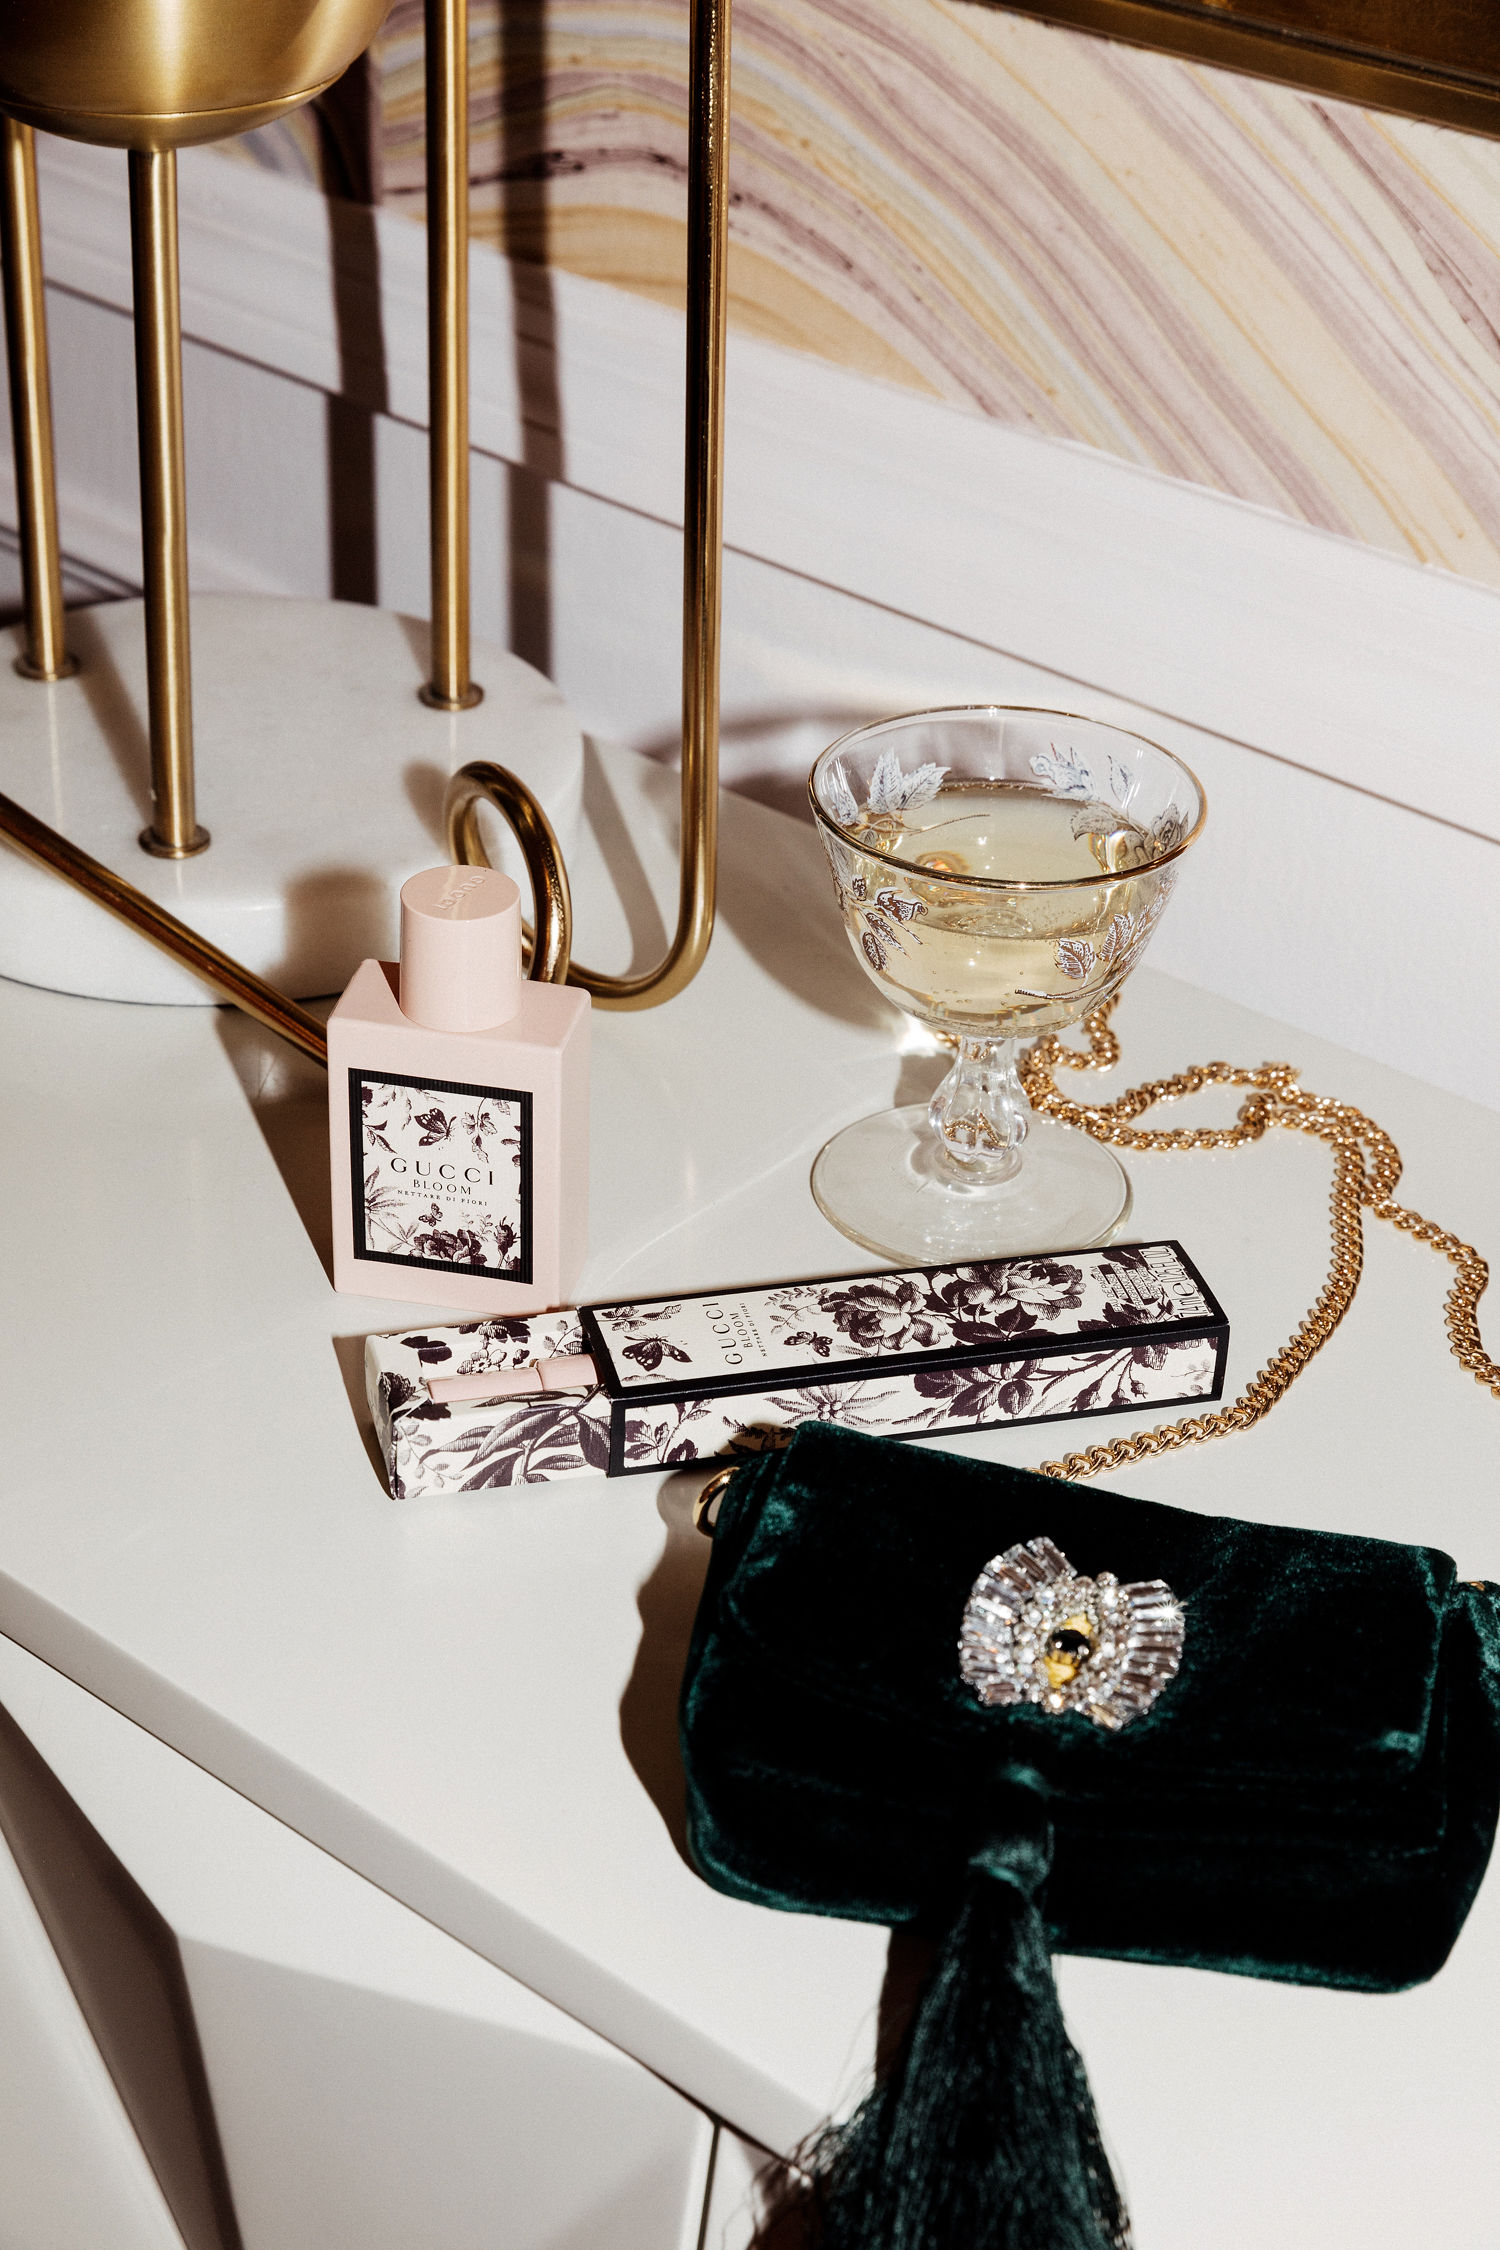 Sephora Fragrances: Gucci Bloom